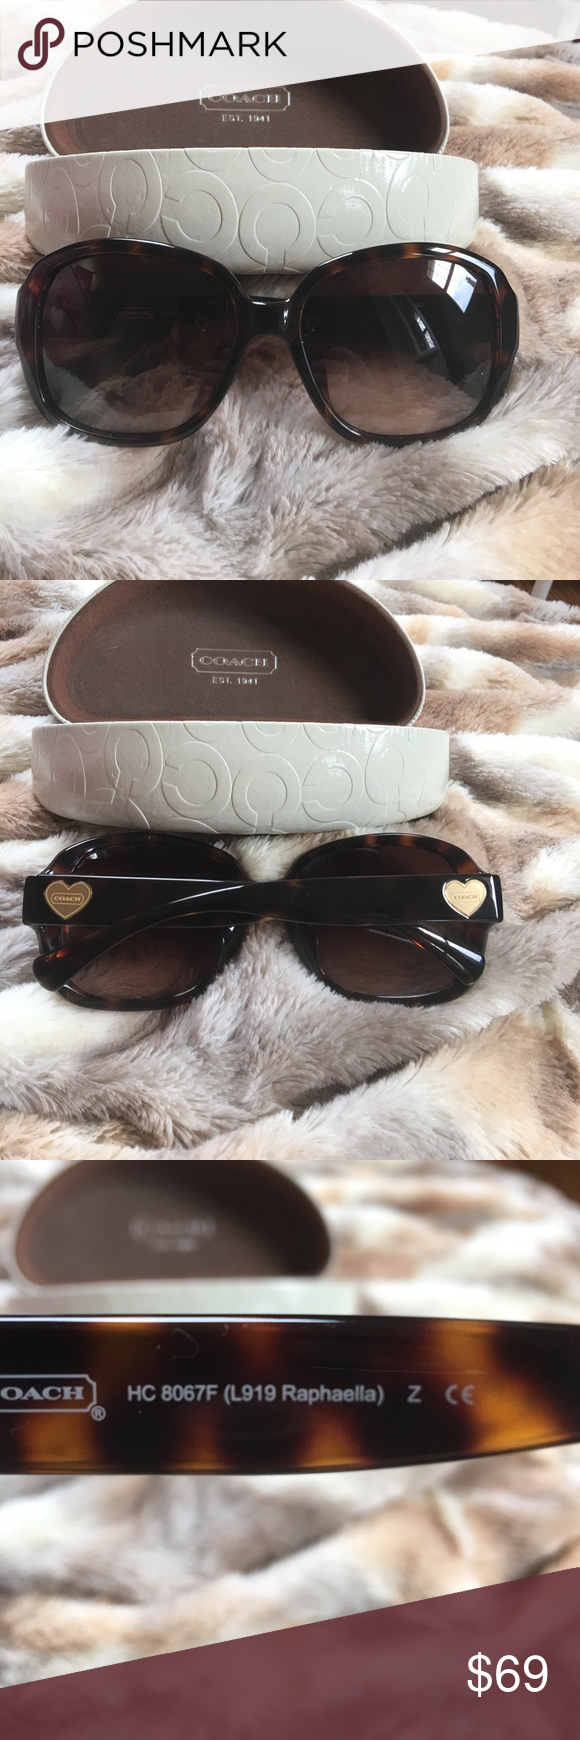 4358f097c32 NEW Coach Raphaella Tortoise Sunglasses Heart Logo RAPHAELLA SUNGLASSES by  COACH TORTOISE 100% UV protection Gradient lenses and Gold Heart Logo on  both ...